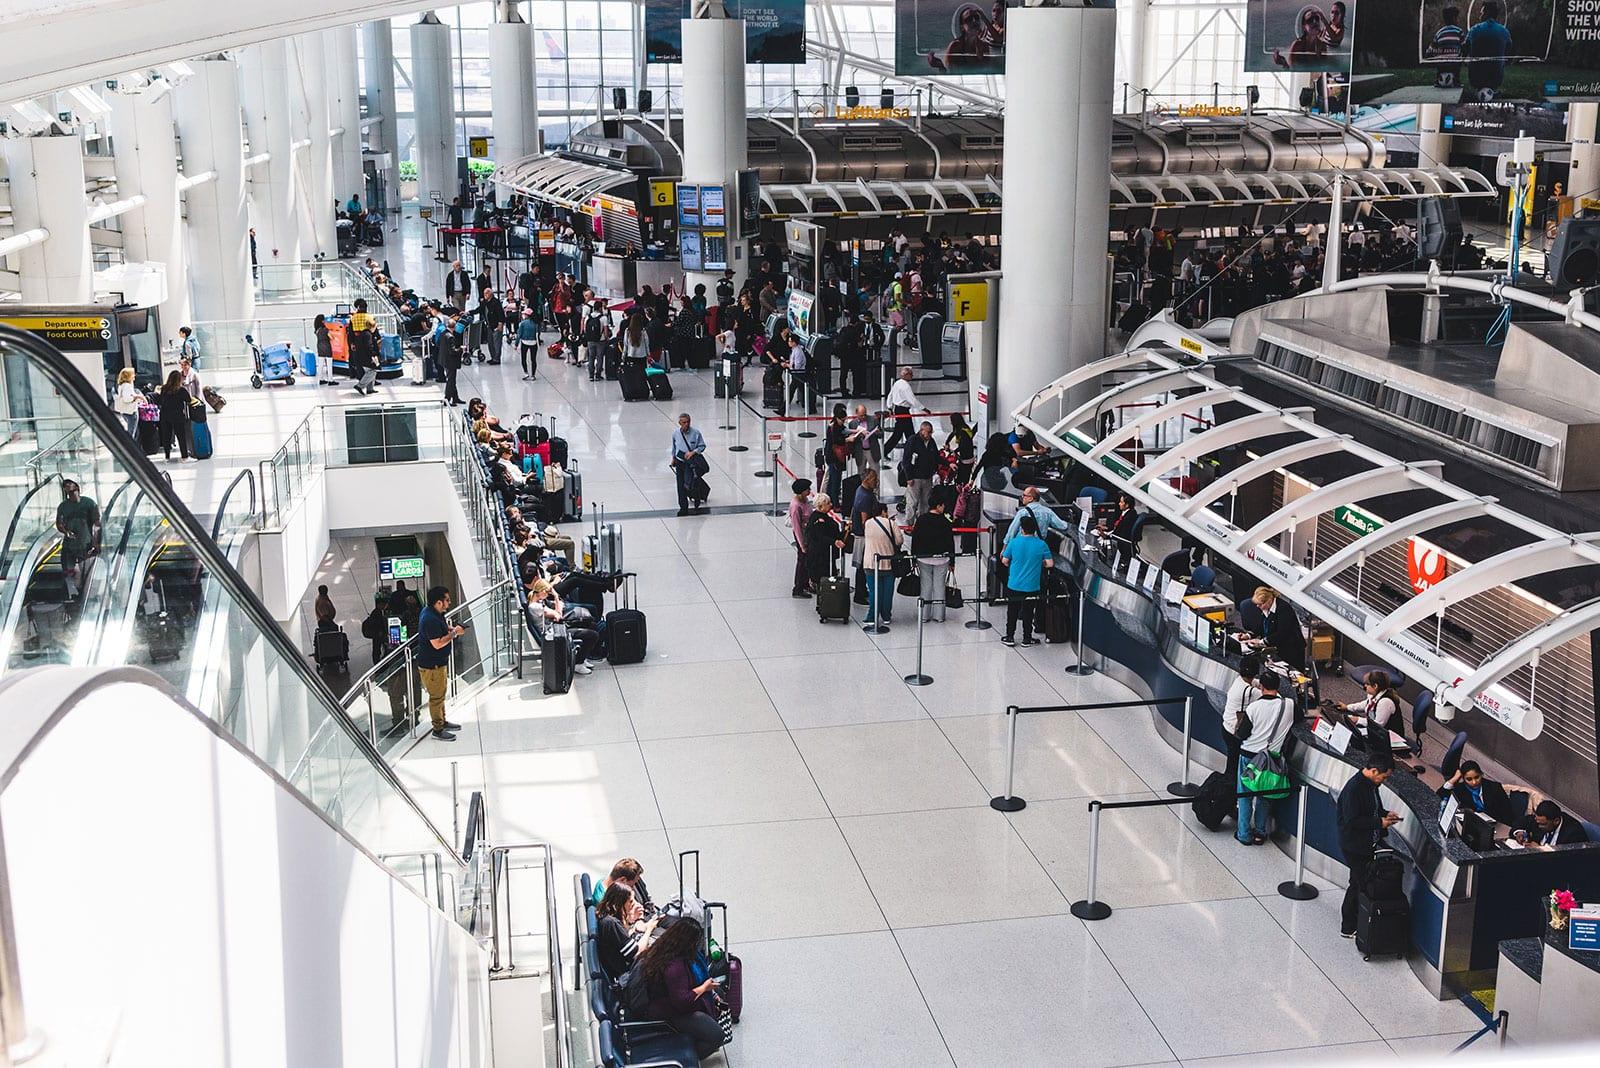 Flughafen New York